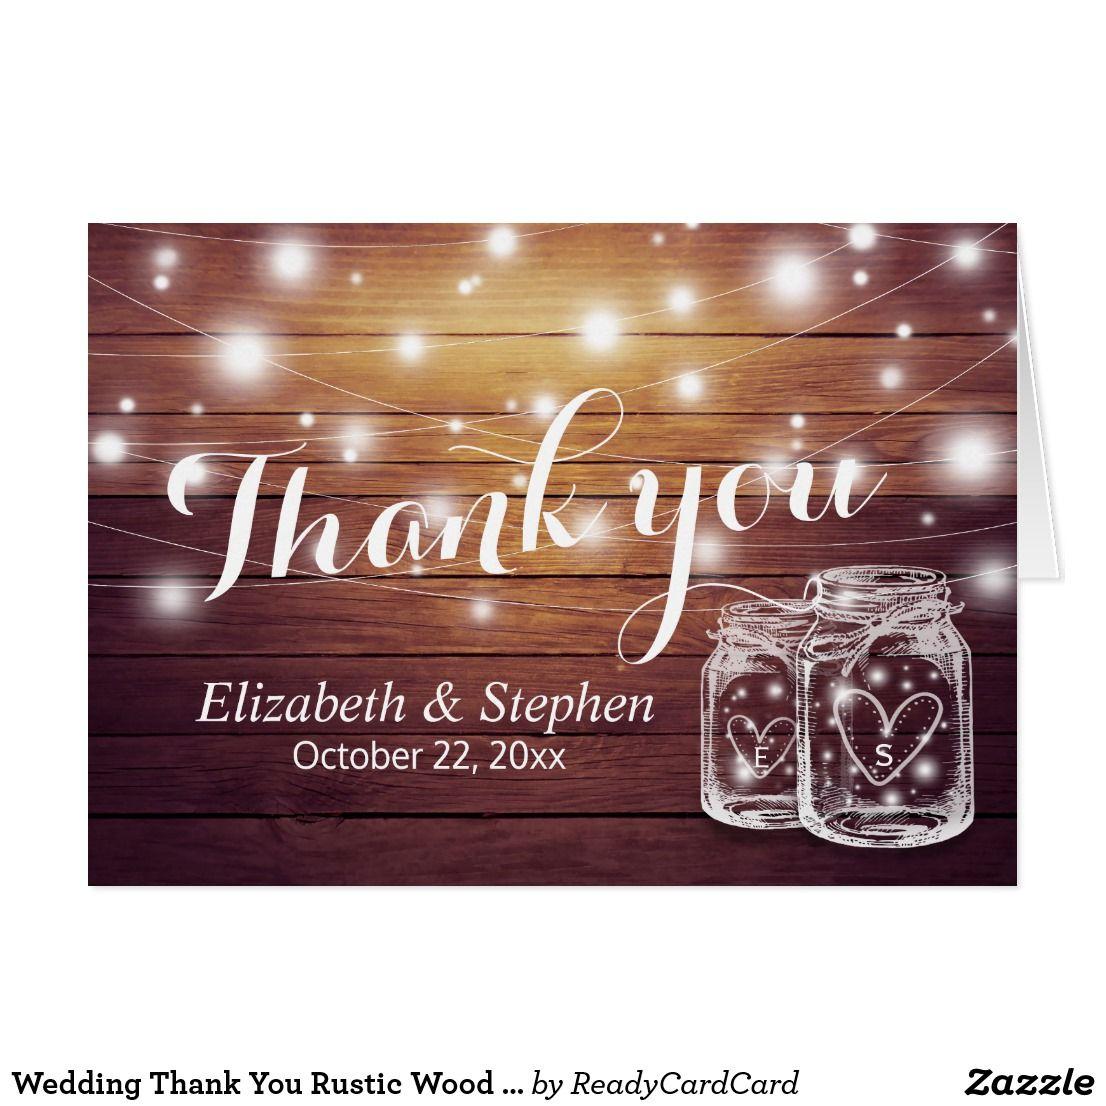 free templates for wedding response cards%0A Wedding Thank You Rustic Wood Mason Jar Lights Card Wedding Thank You Card  Templates  Elegant